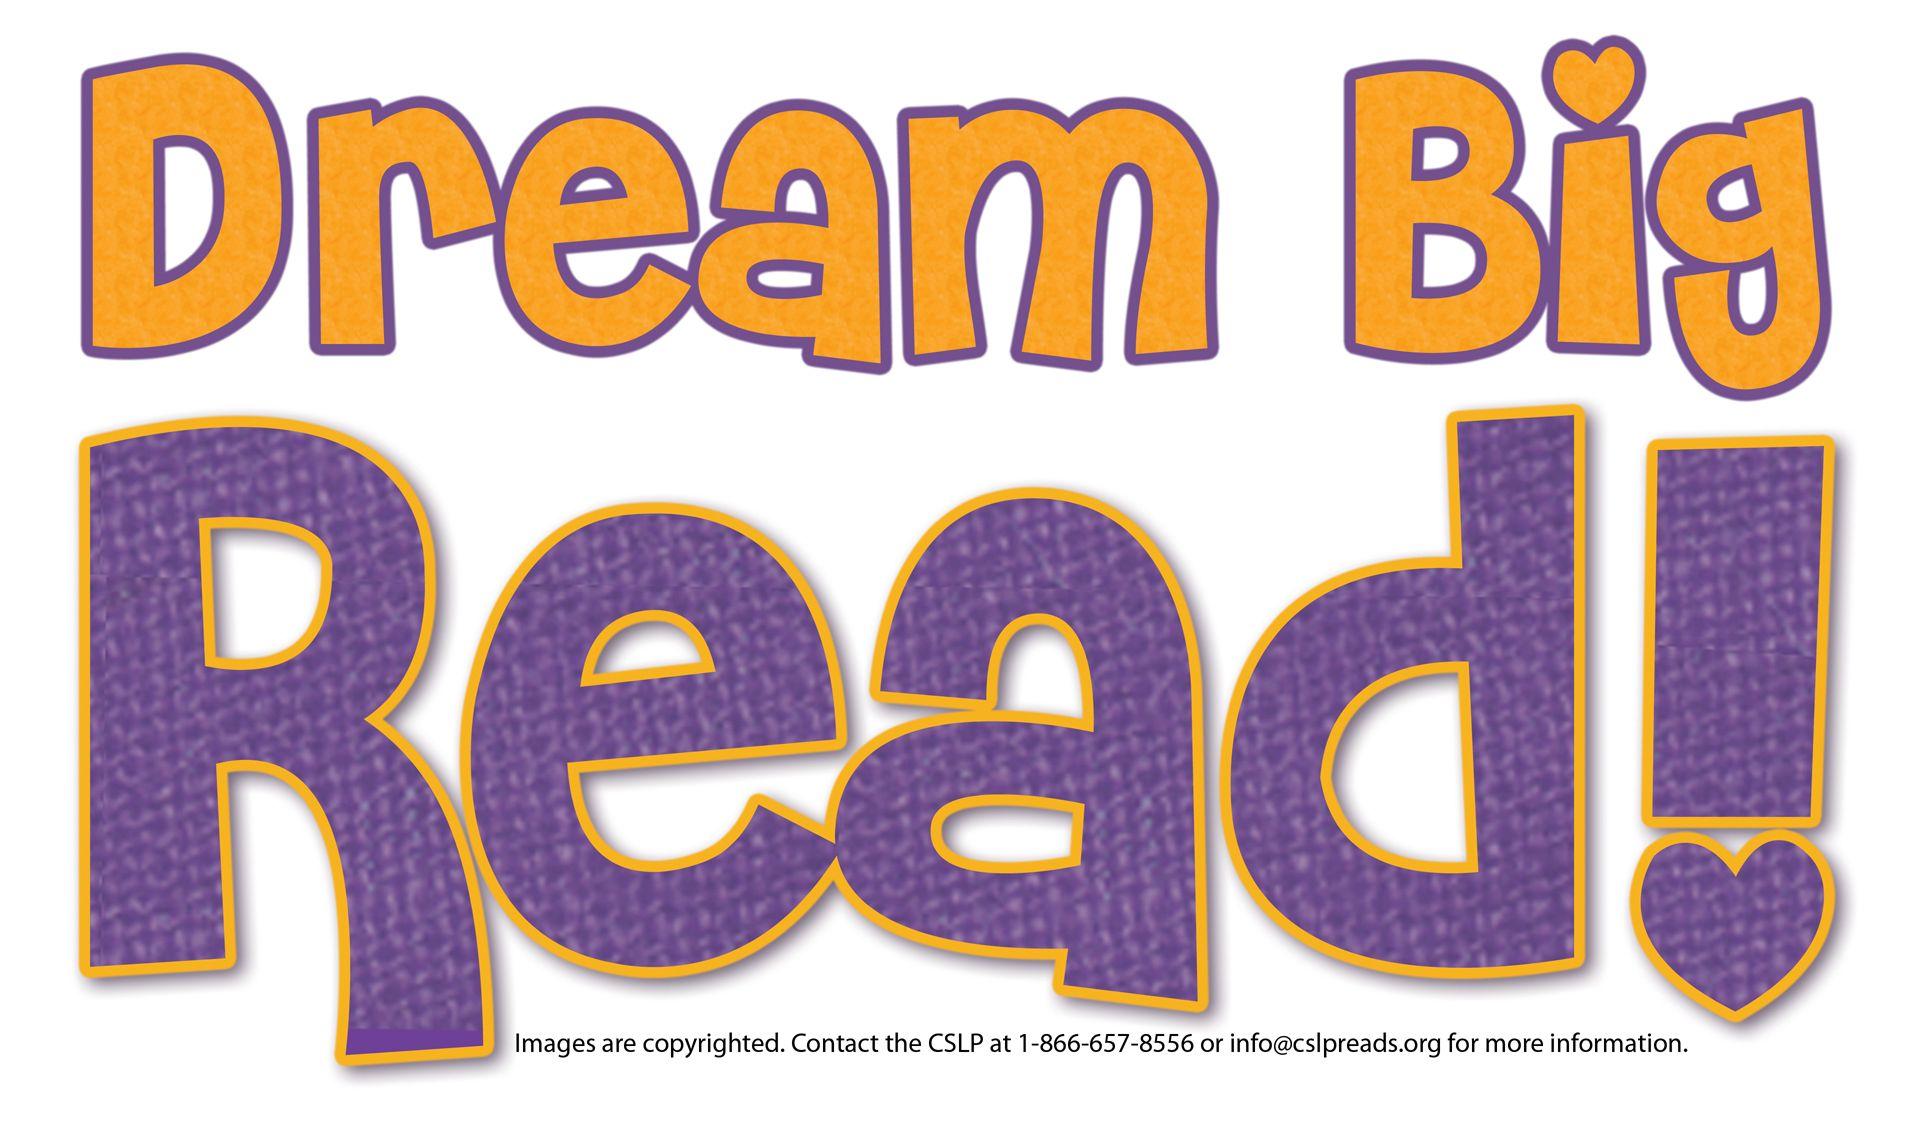 summer read clip art 2012 nightime dream big 001.